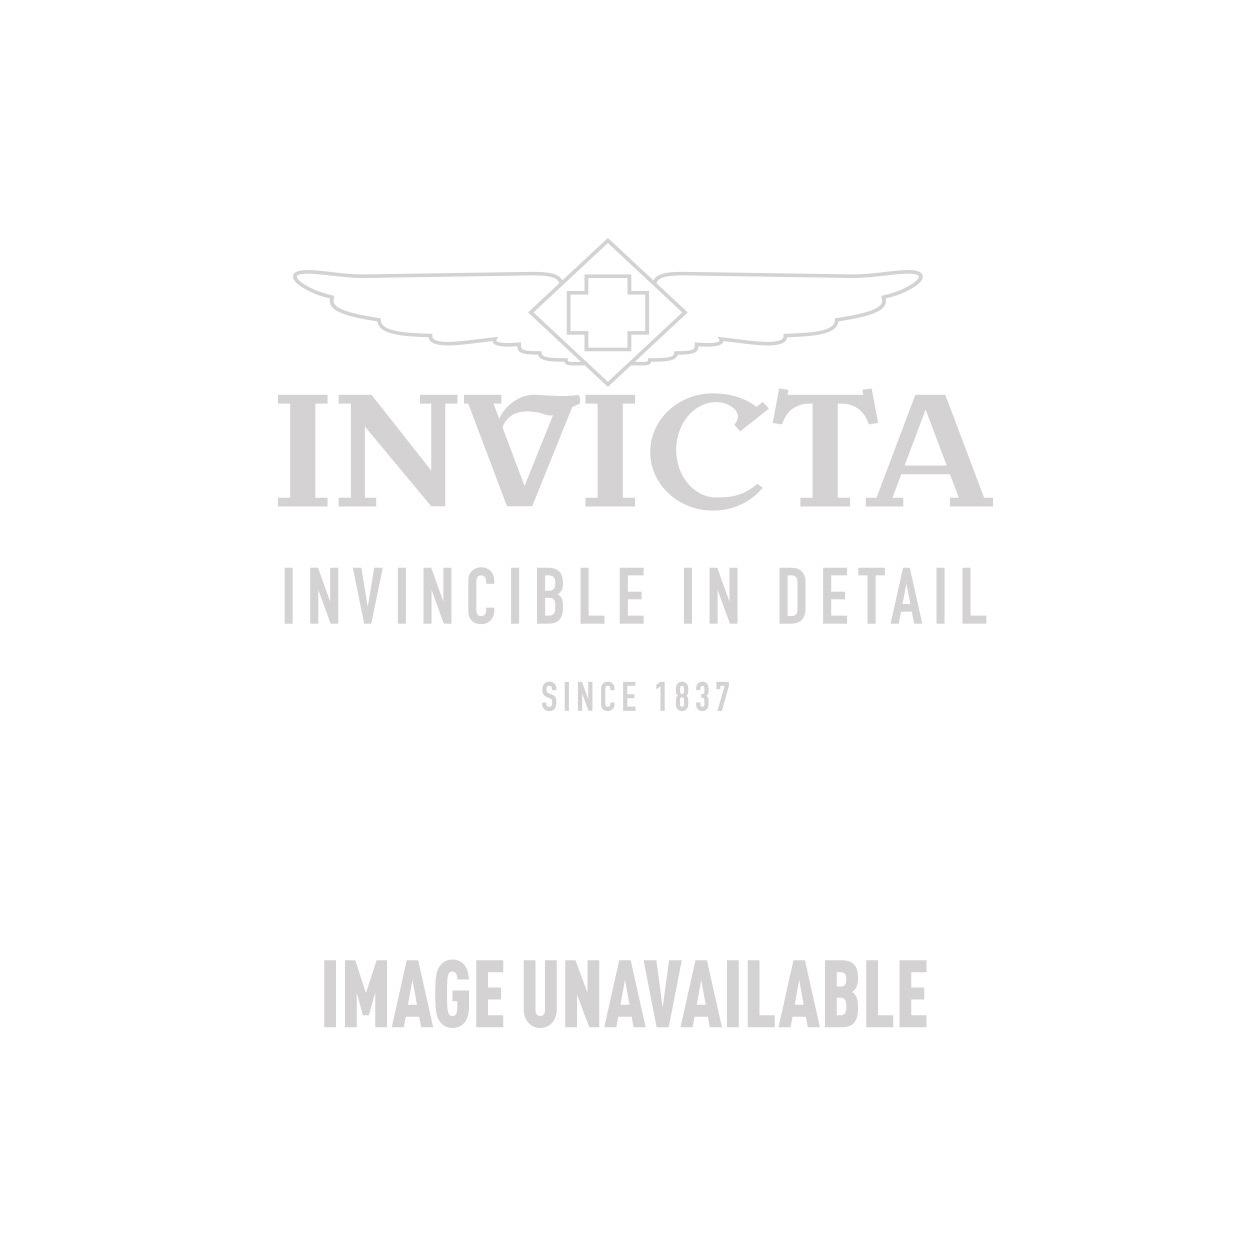 5c0f191ffe629 Invicta Bolt Mens Quartz 53 mm Gold, Stainless Steel Case Black, White Dial  - Model 28159